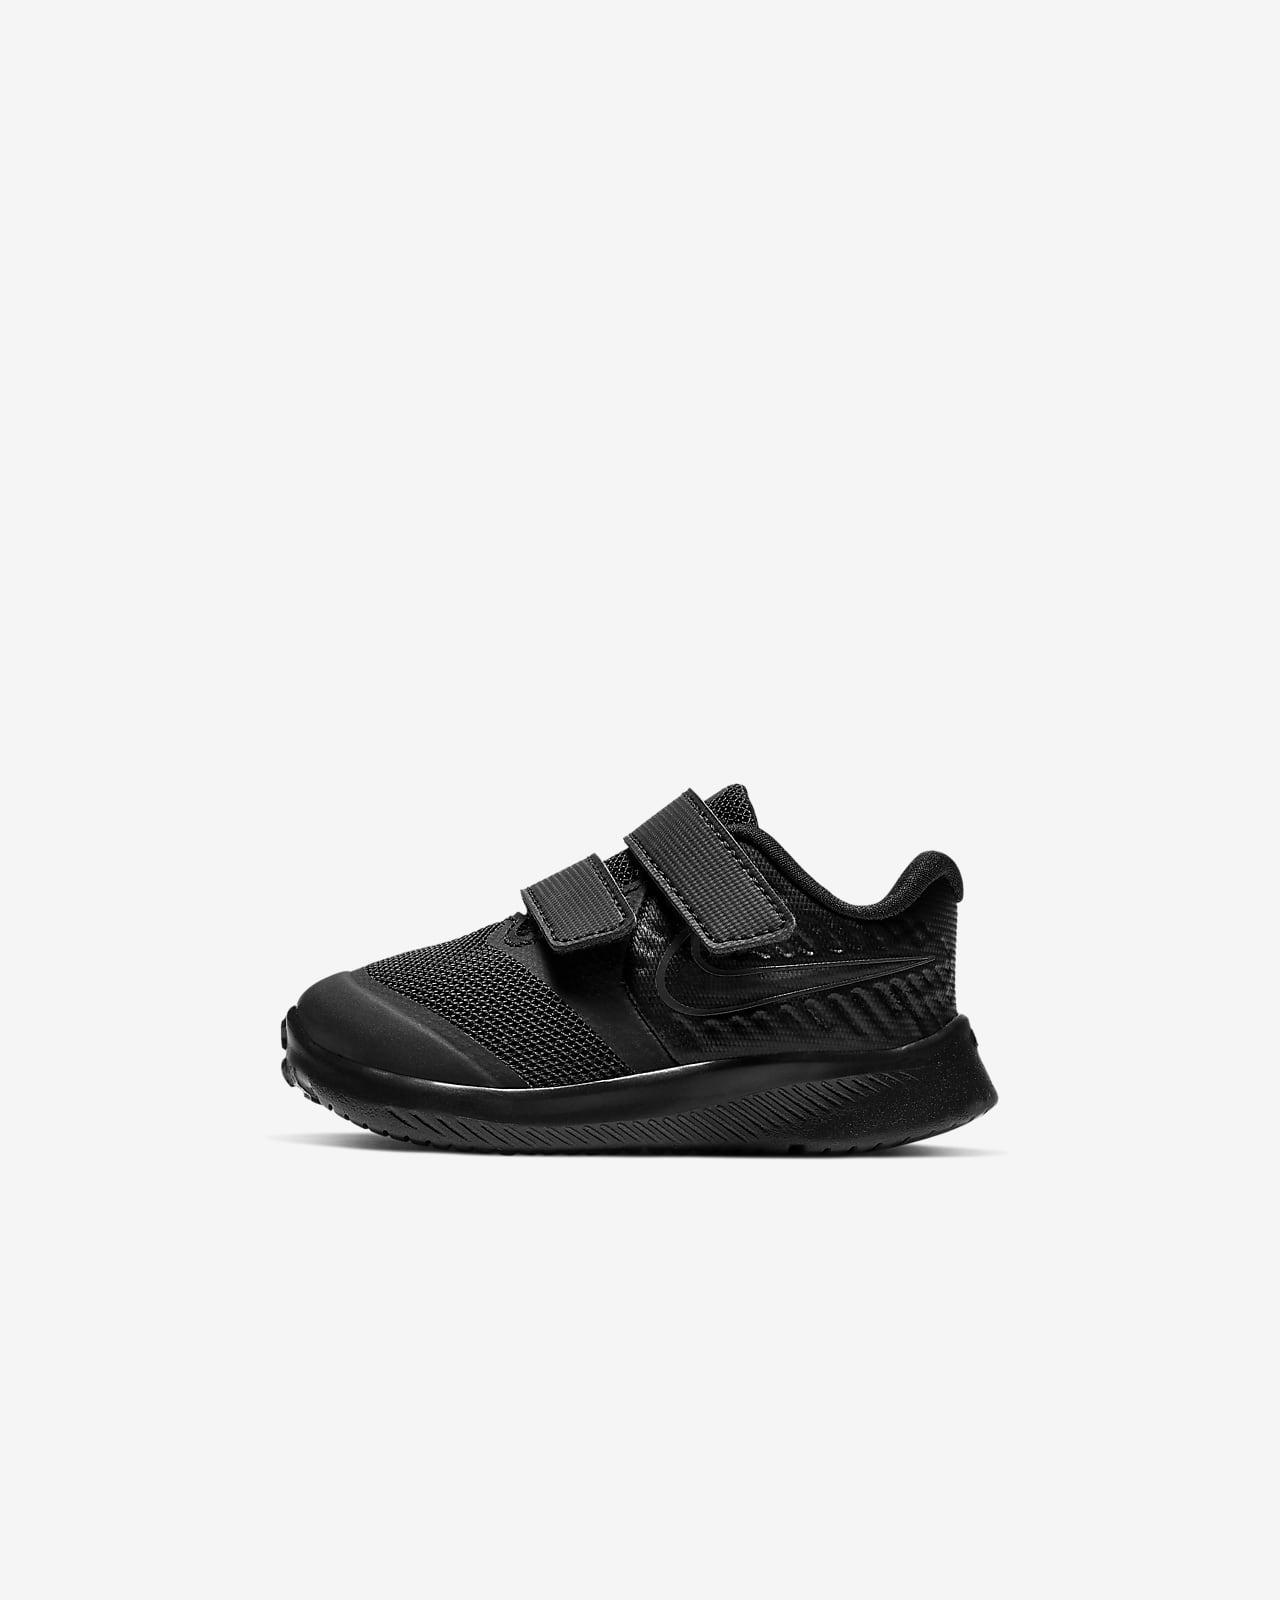 Nike Star Runner 2 Baby & Toddler Shoe